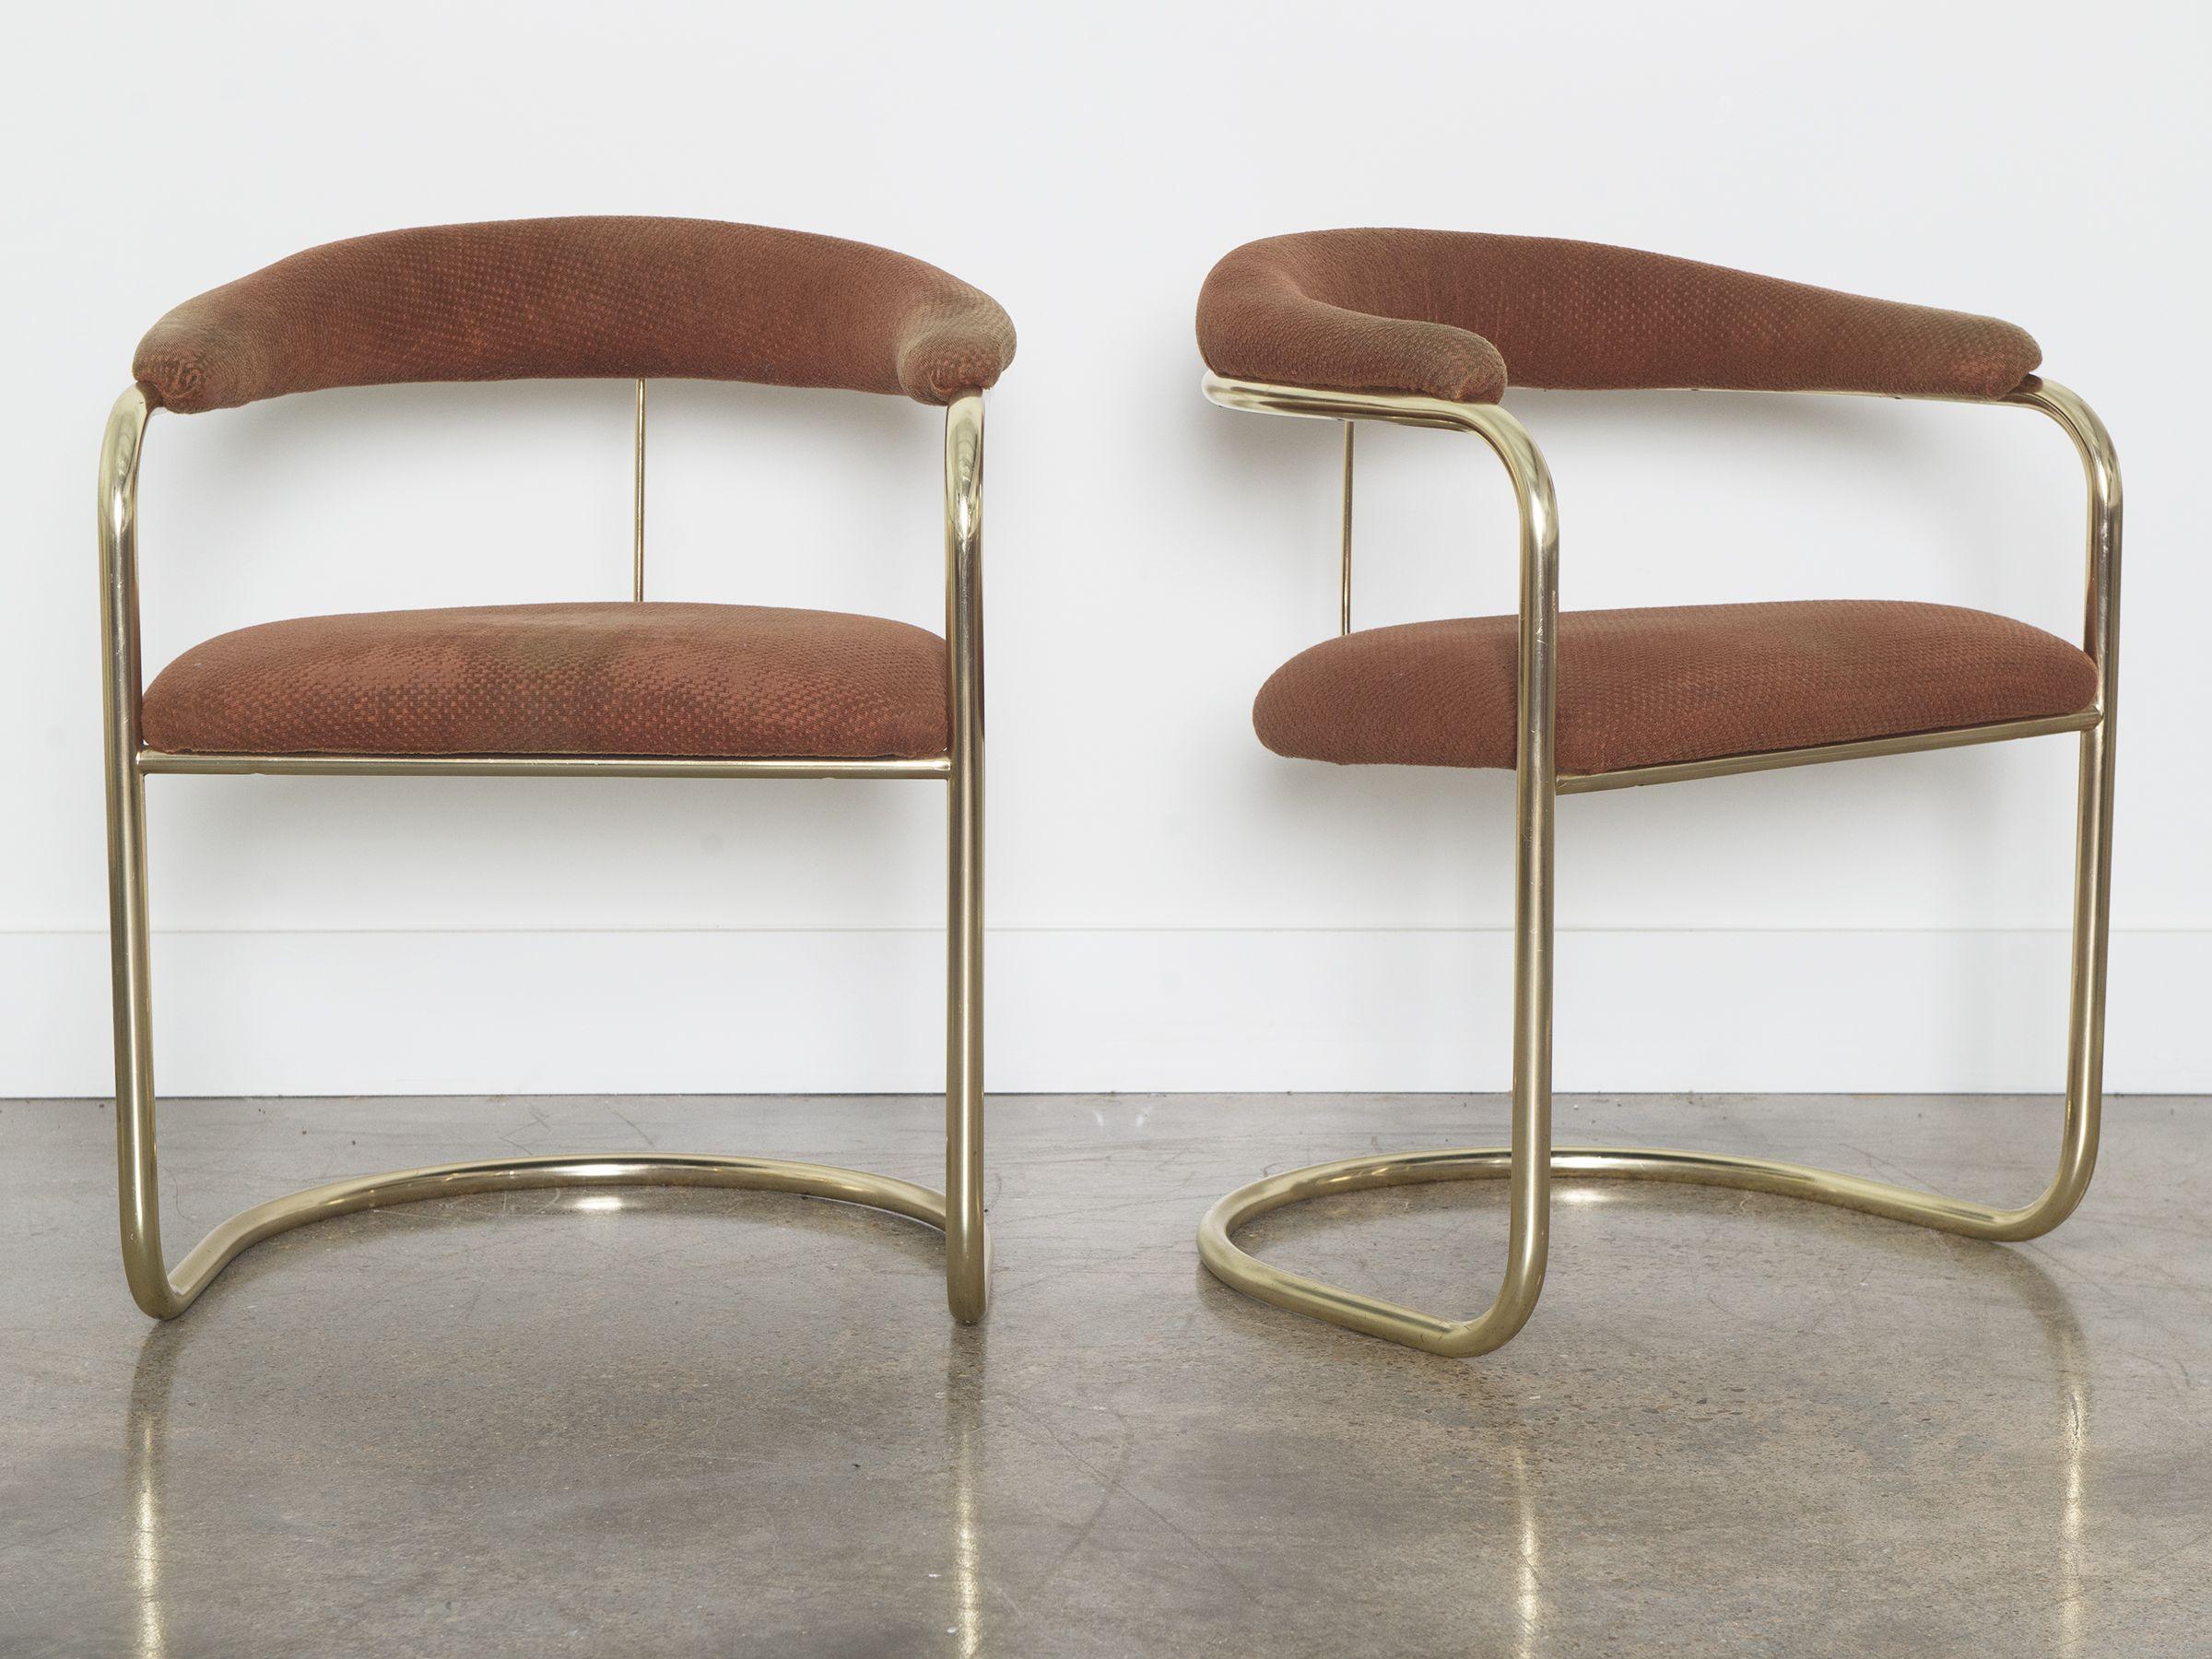 Beau Anton Lorenz Brass Chairs By Thonet (6)